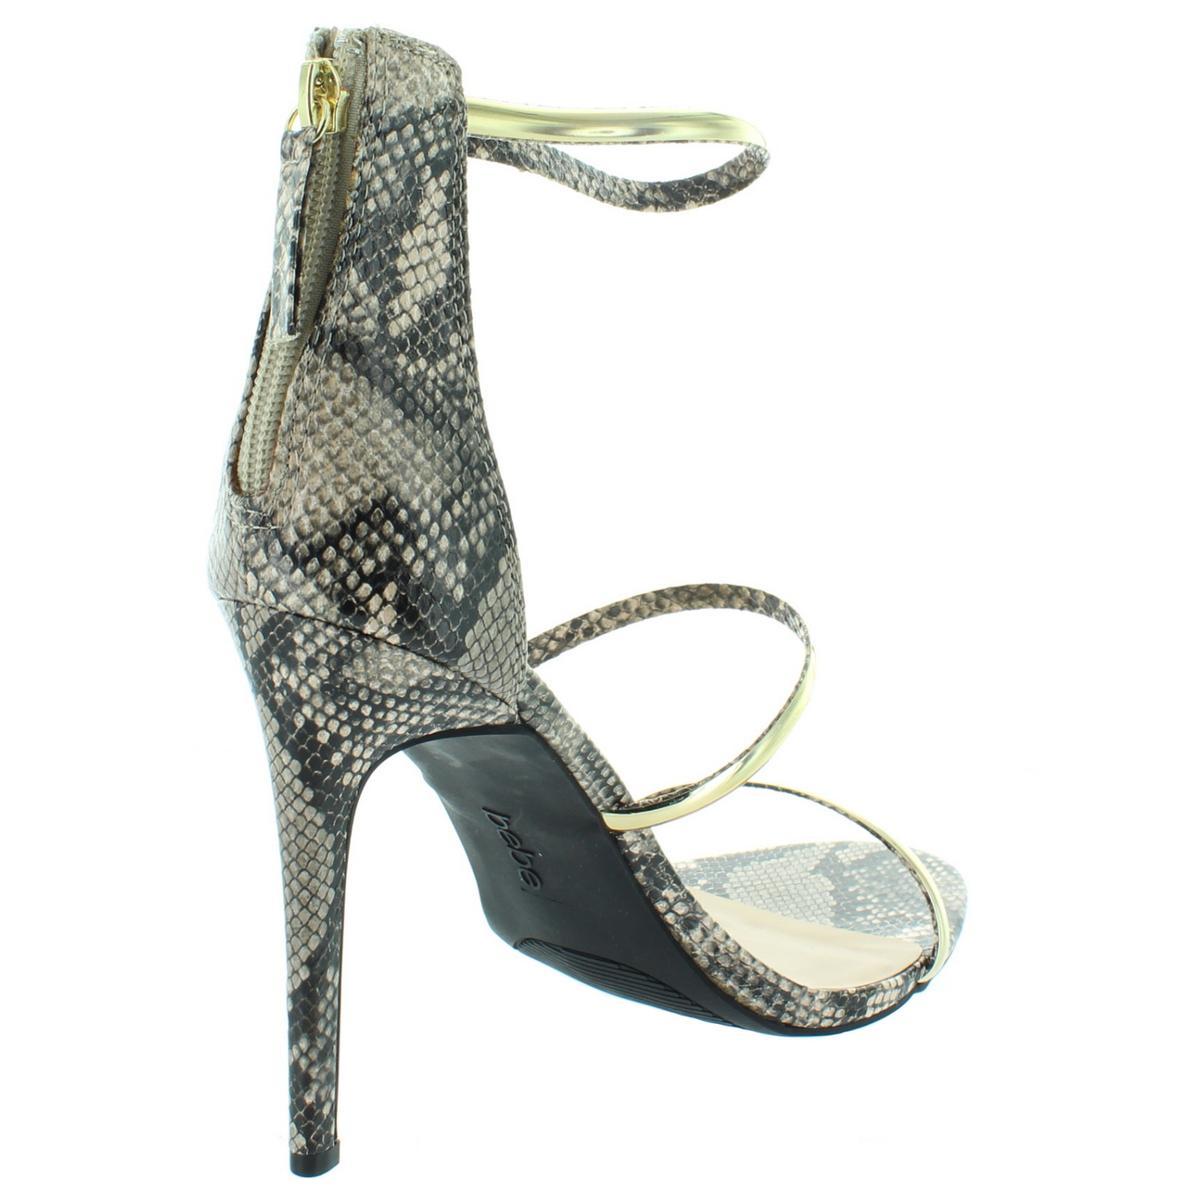 Bebe-Womens-Berdine-Strappy-Textured-Ankle-Strap-Dress-Sandals-Heels-BHFO-6118 thumbnail 4